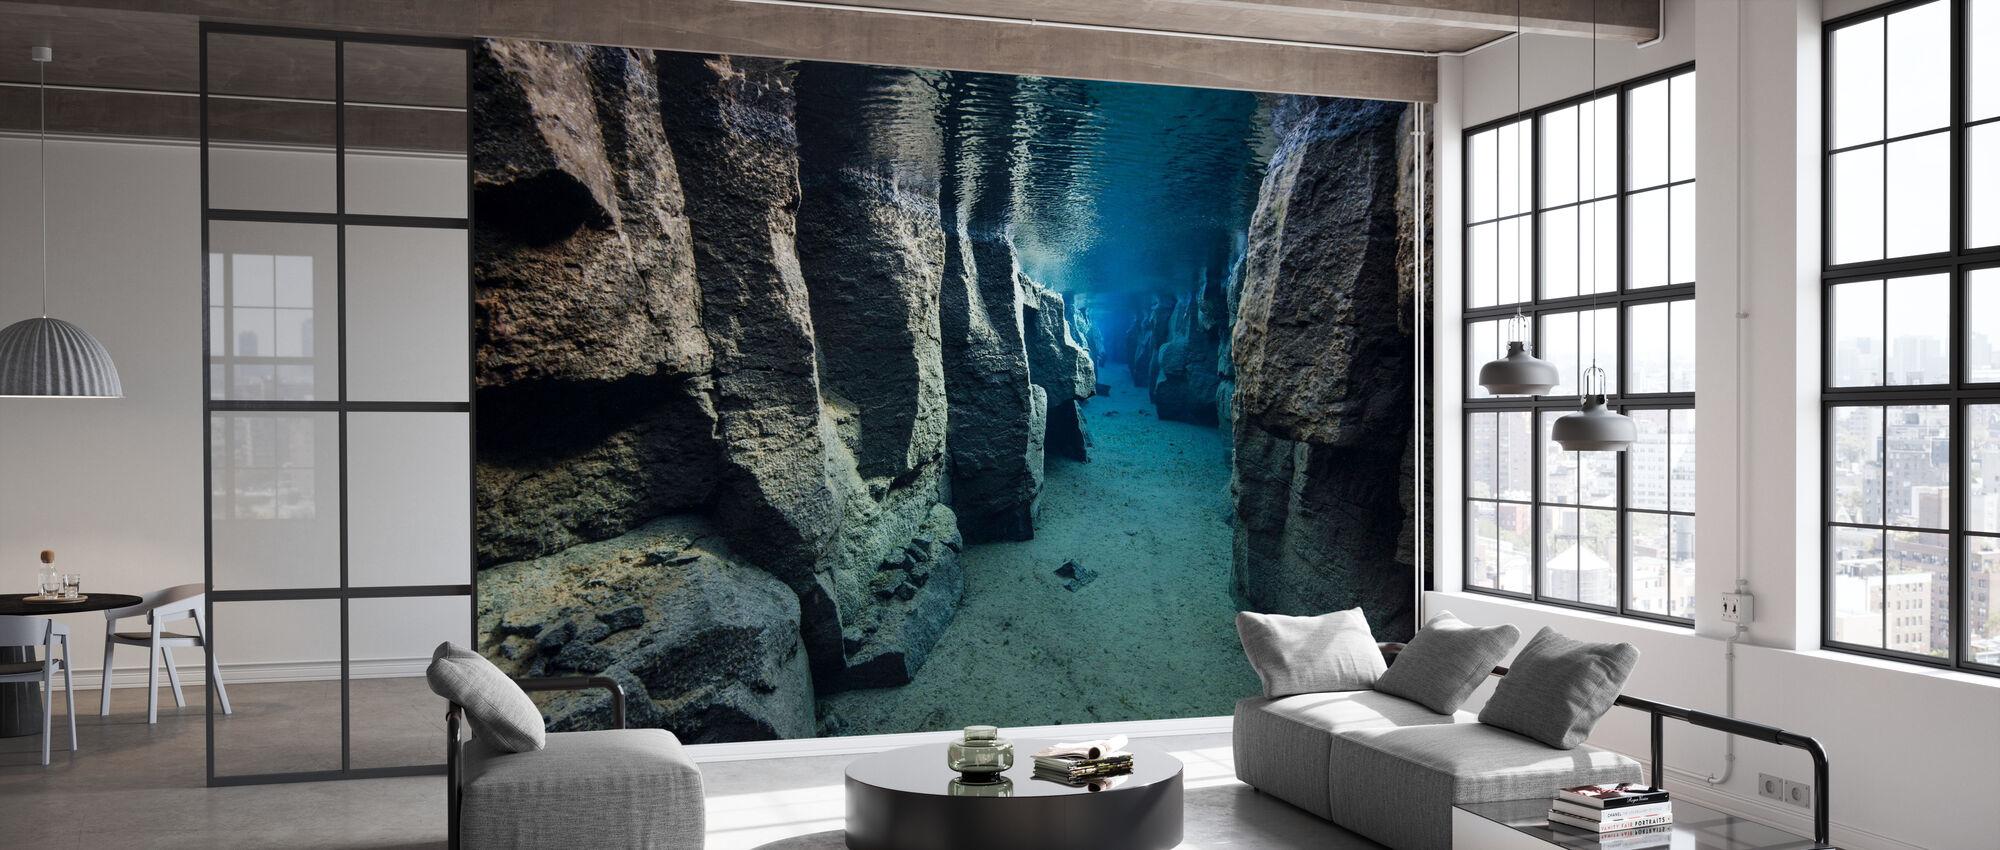 Rift Valley - Wallpaper - Office